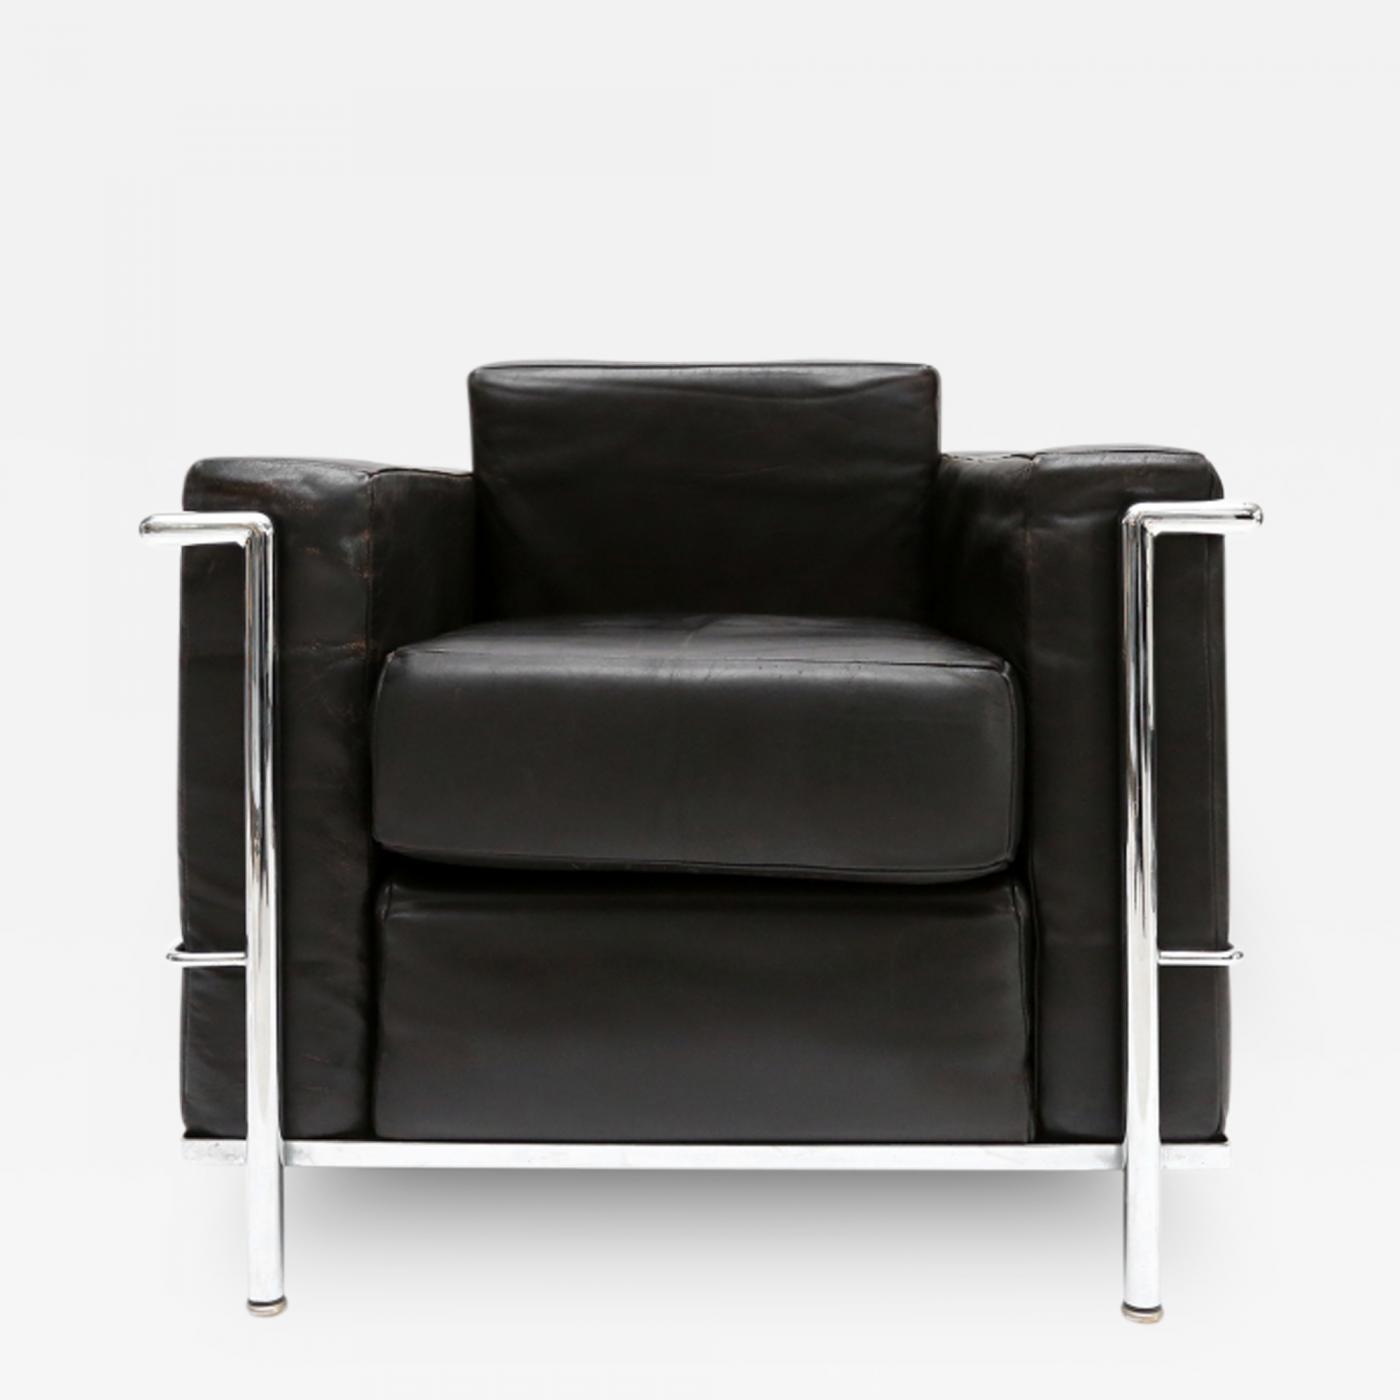 le corbusier jeanneret perriand original 1st edition lc2. Black Bedroom Furniture Sets. Home Design Ideas